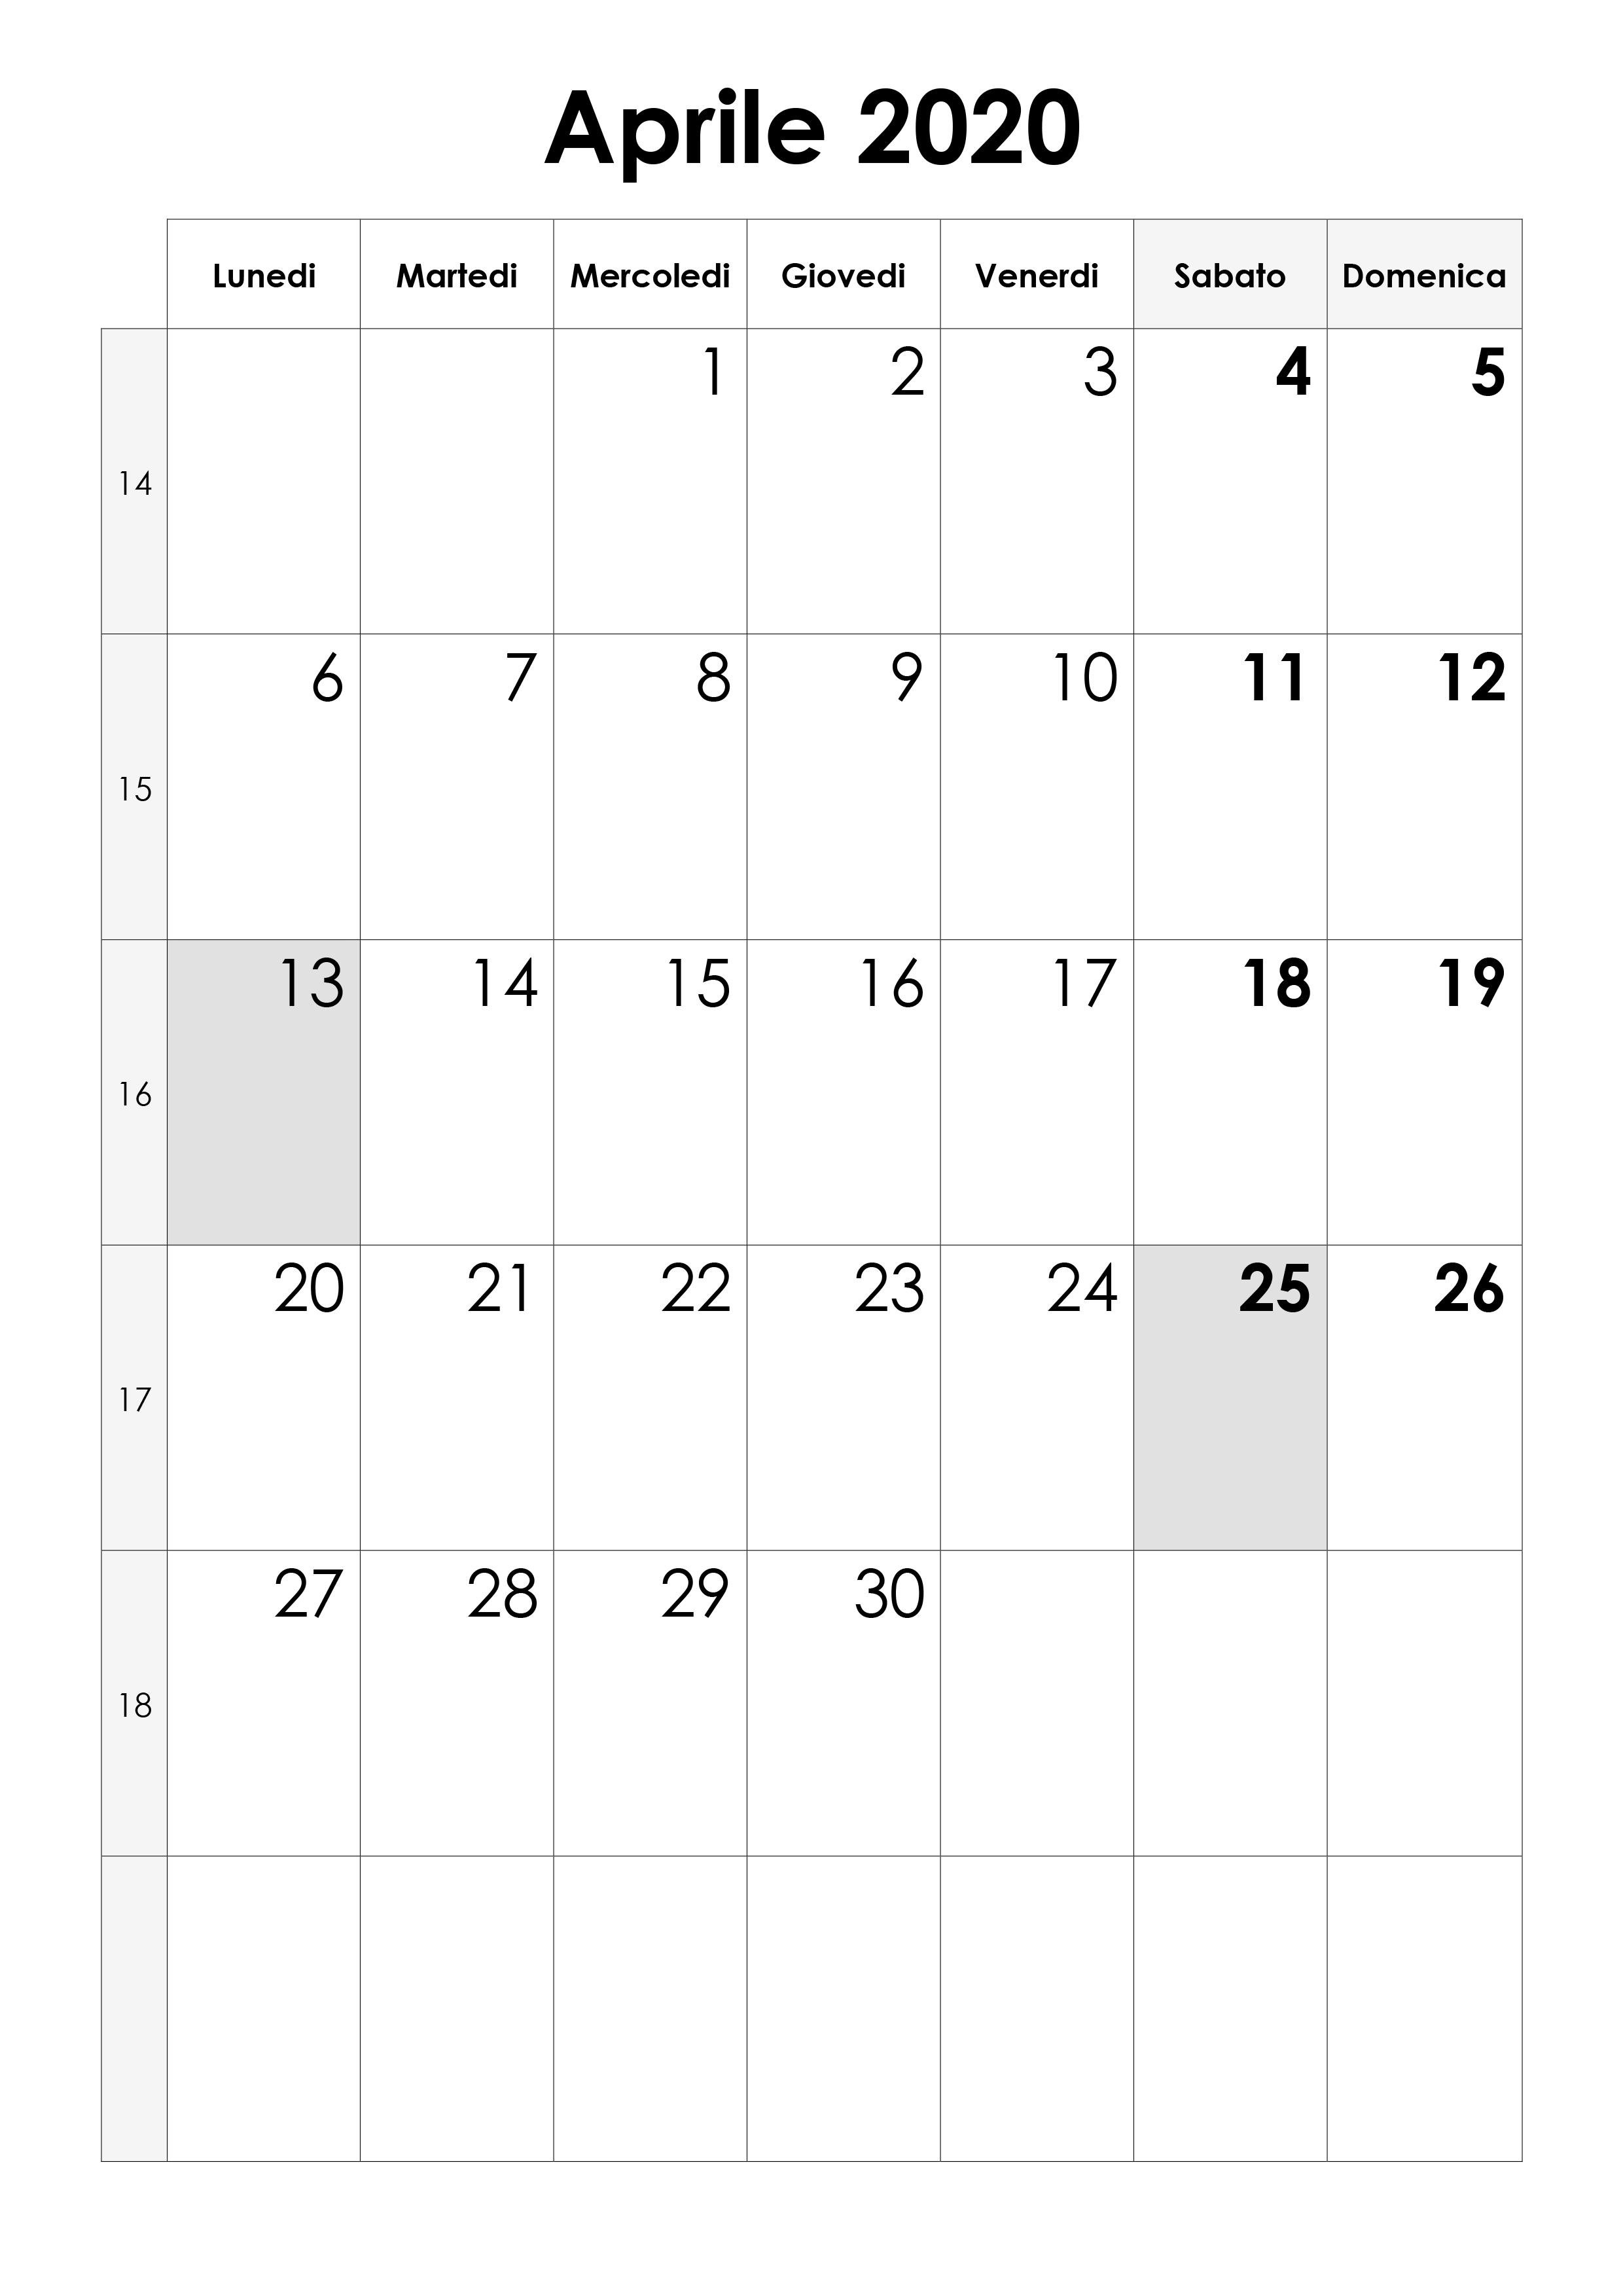 Calendario Mensile Aprile 2020.Calendario Aprile 2020 Calendario Su